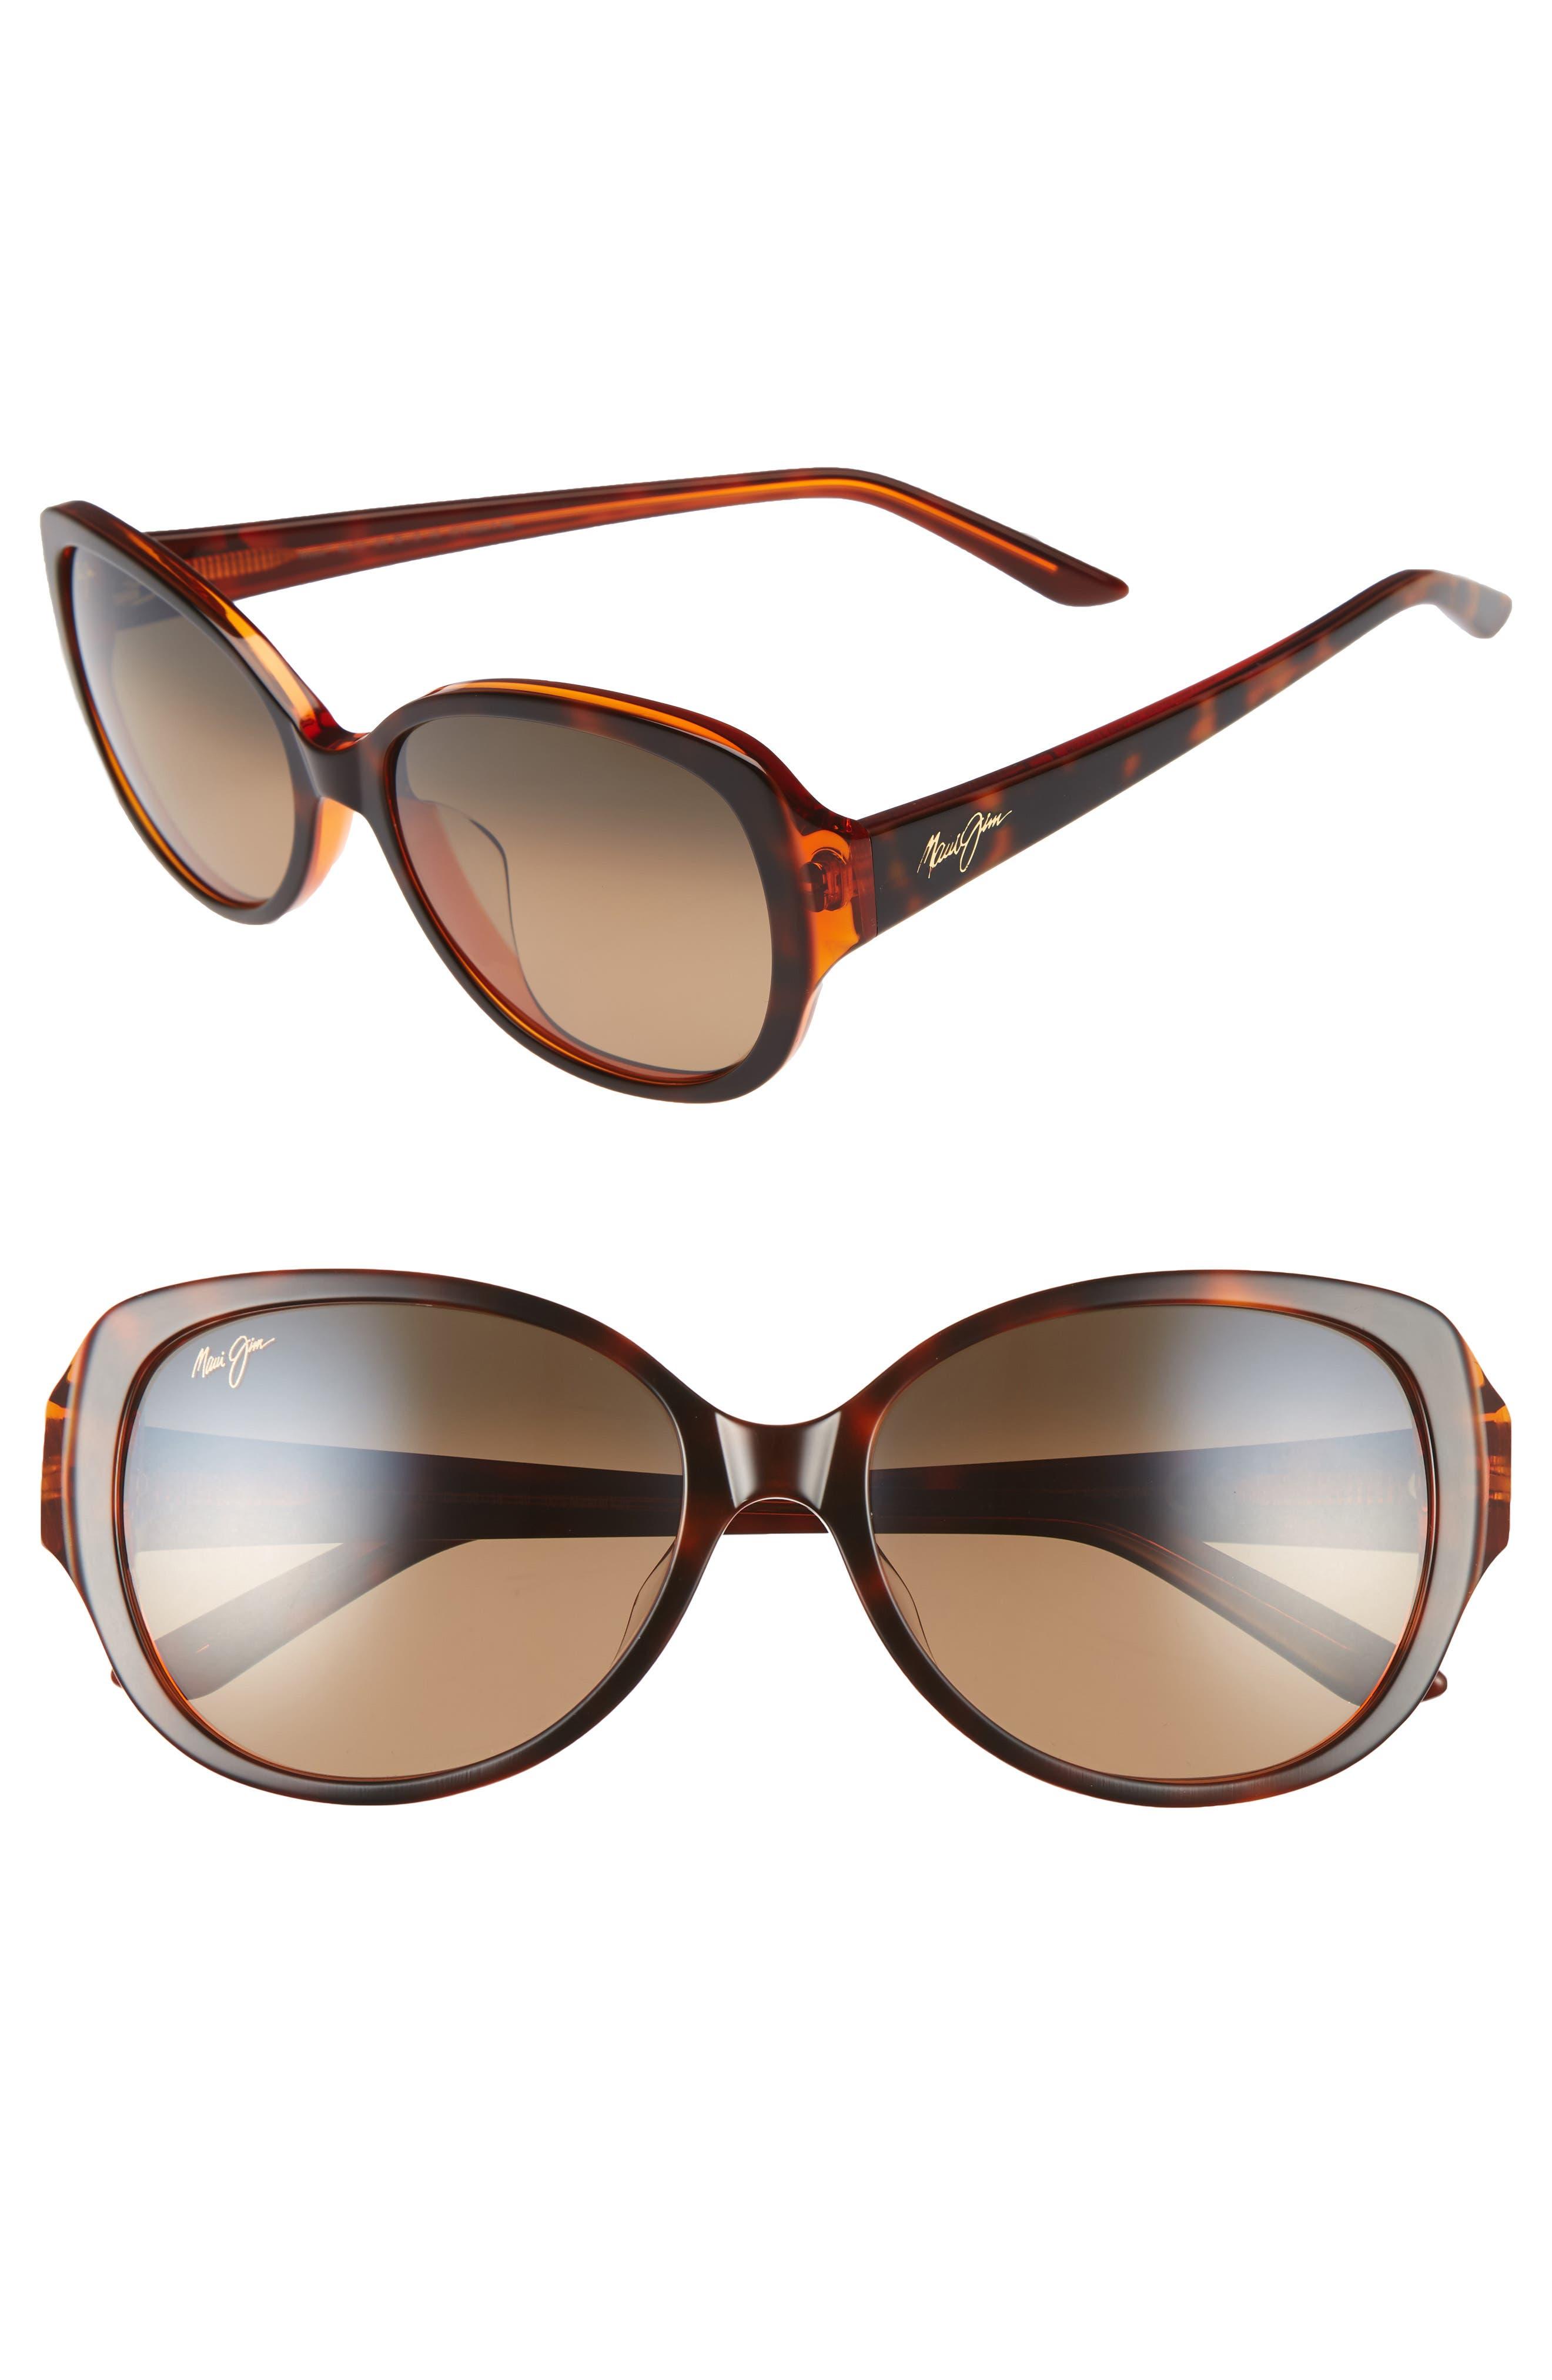 Maui Jim Swept Away 5m Polarizedplus2 Sunglasses - Tortoise Caramel/ Hcl Bronze